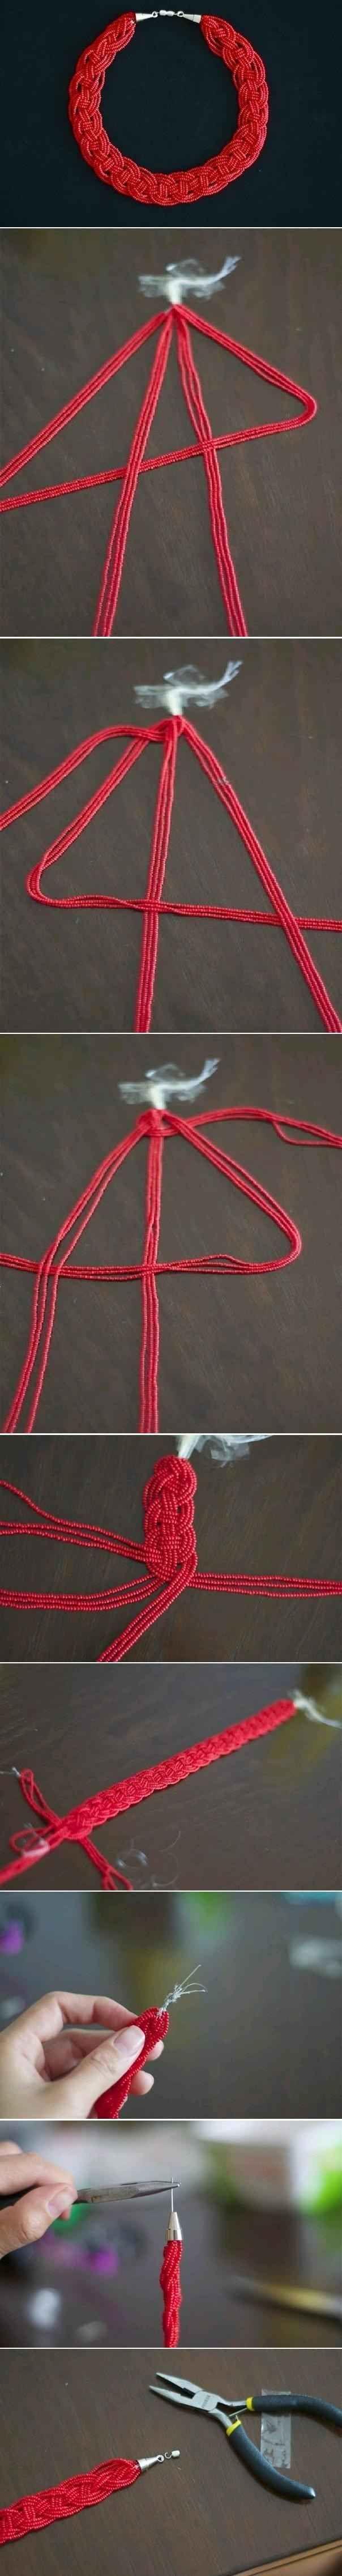 Four Strand Braid | 24 Super Easy DIY Bracelets